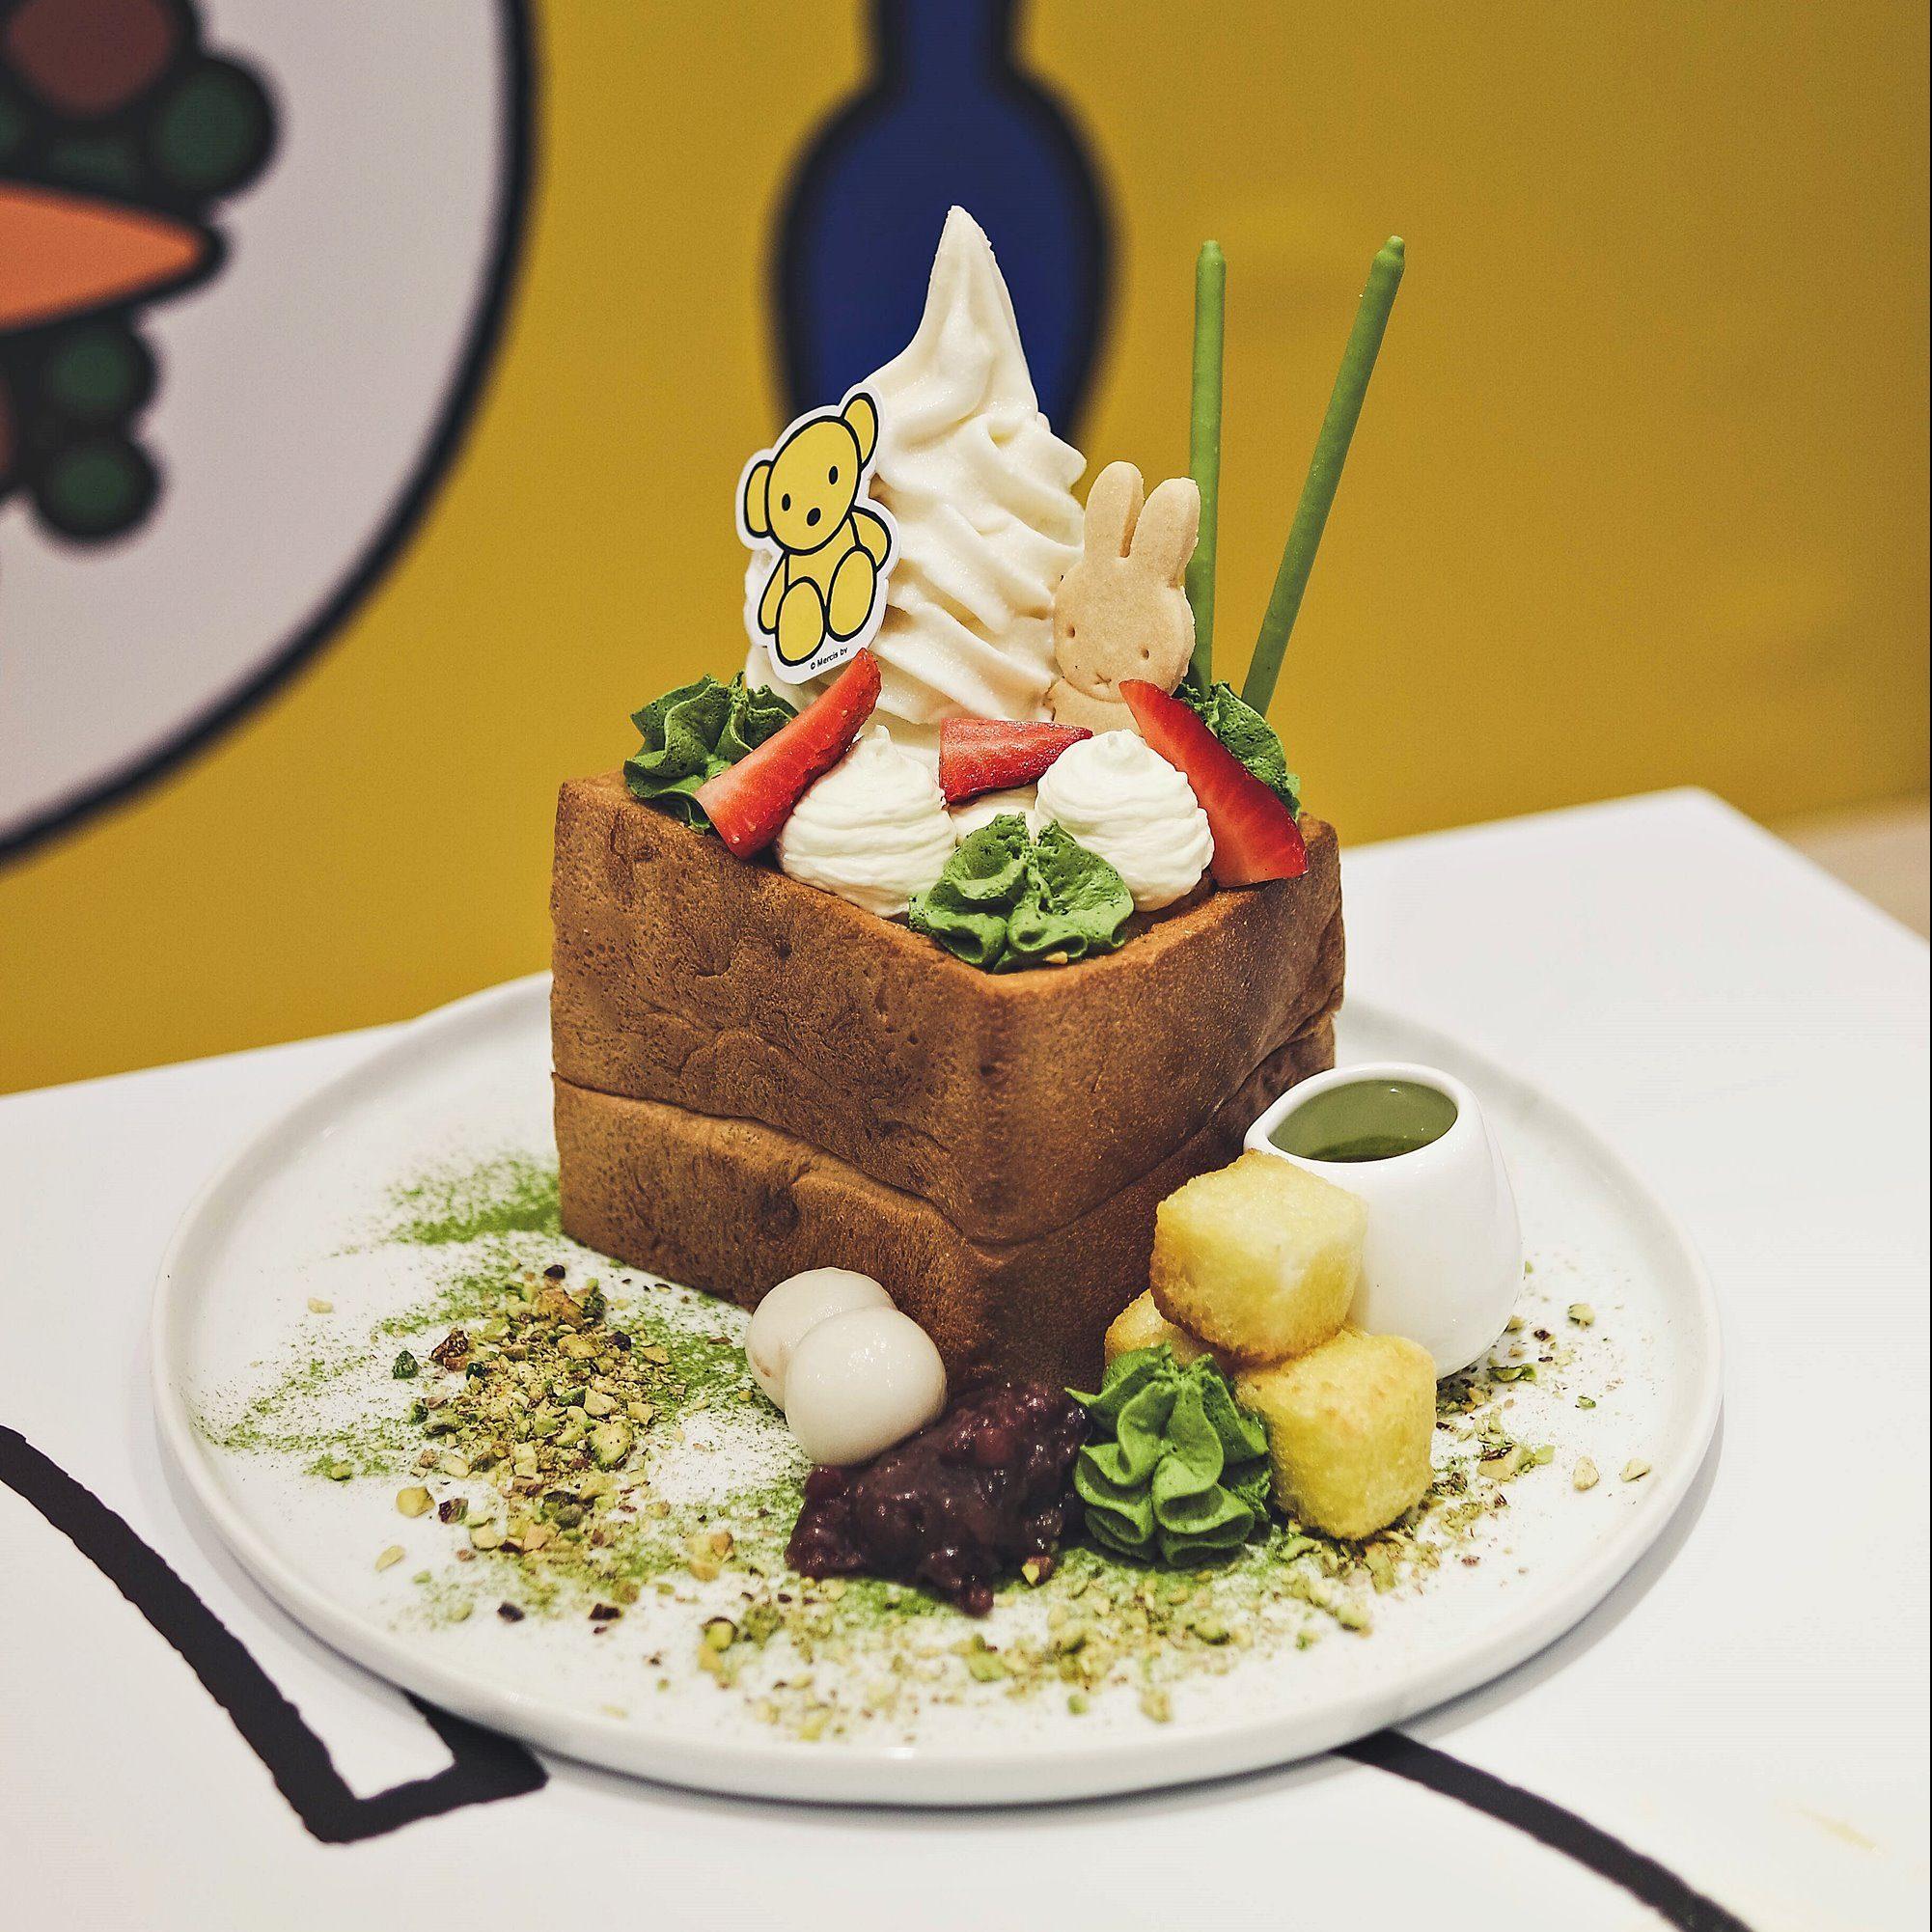 Matcha Mountain Azuki Shibuya Toast - Miffy Character Themed Cafe - Kumoya